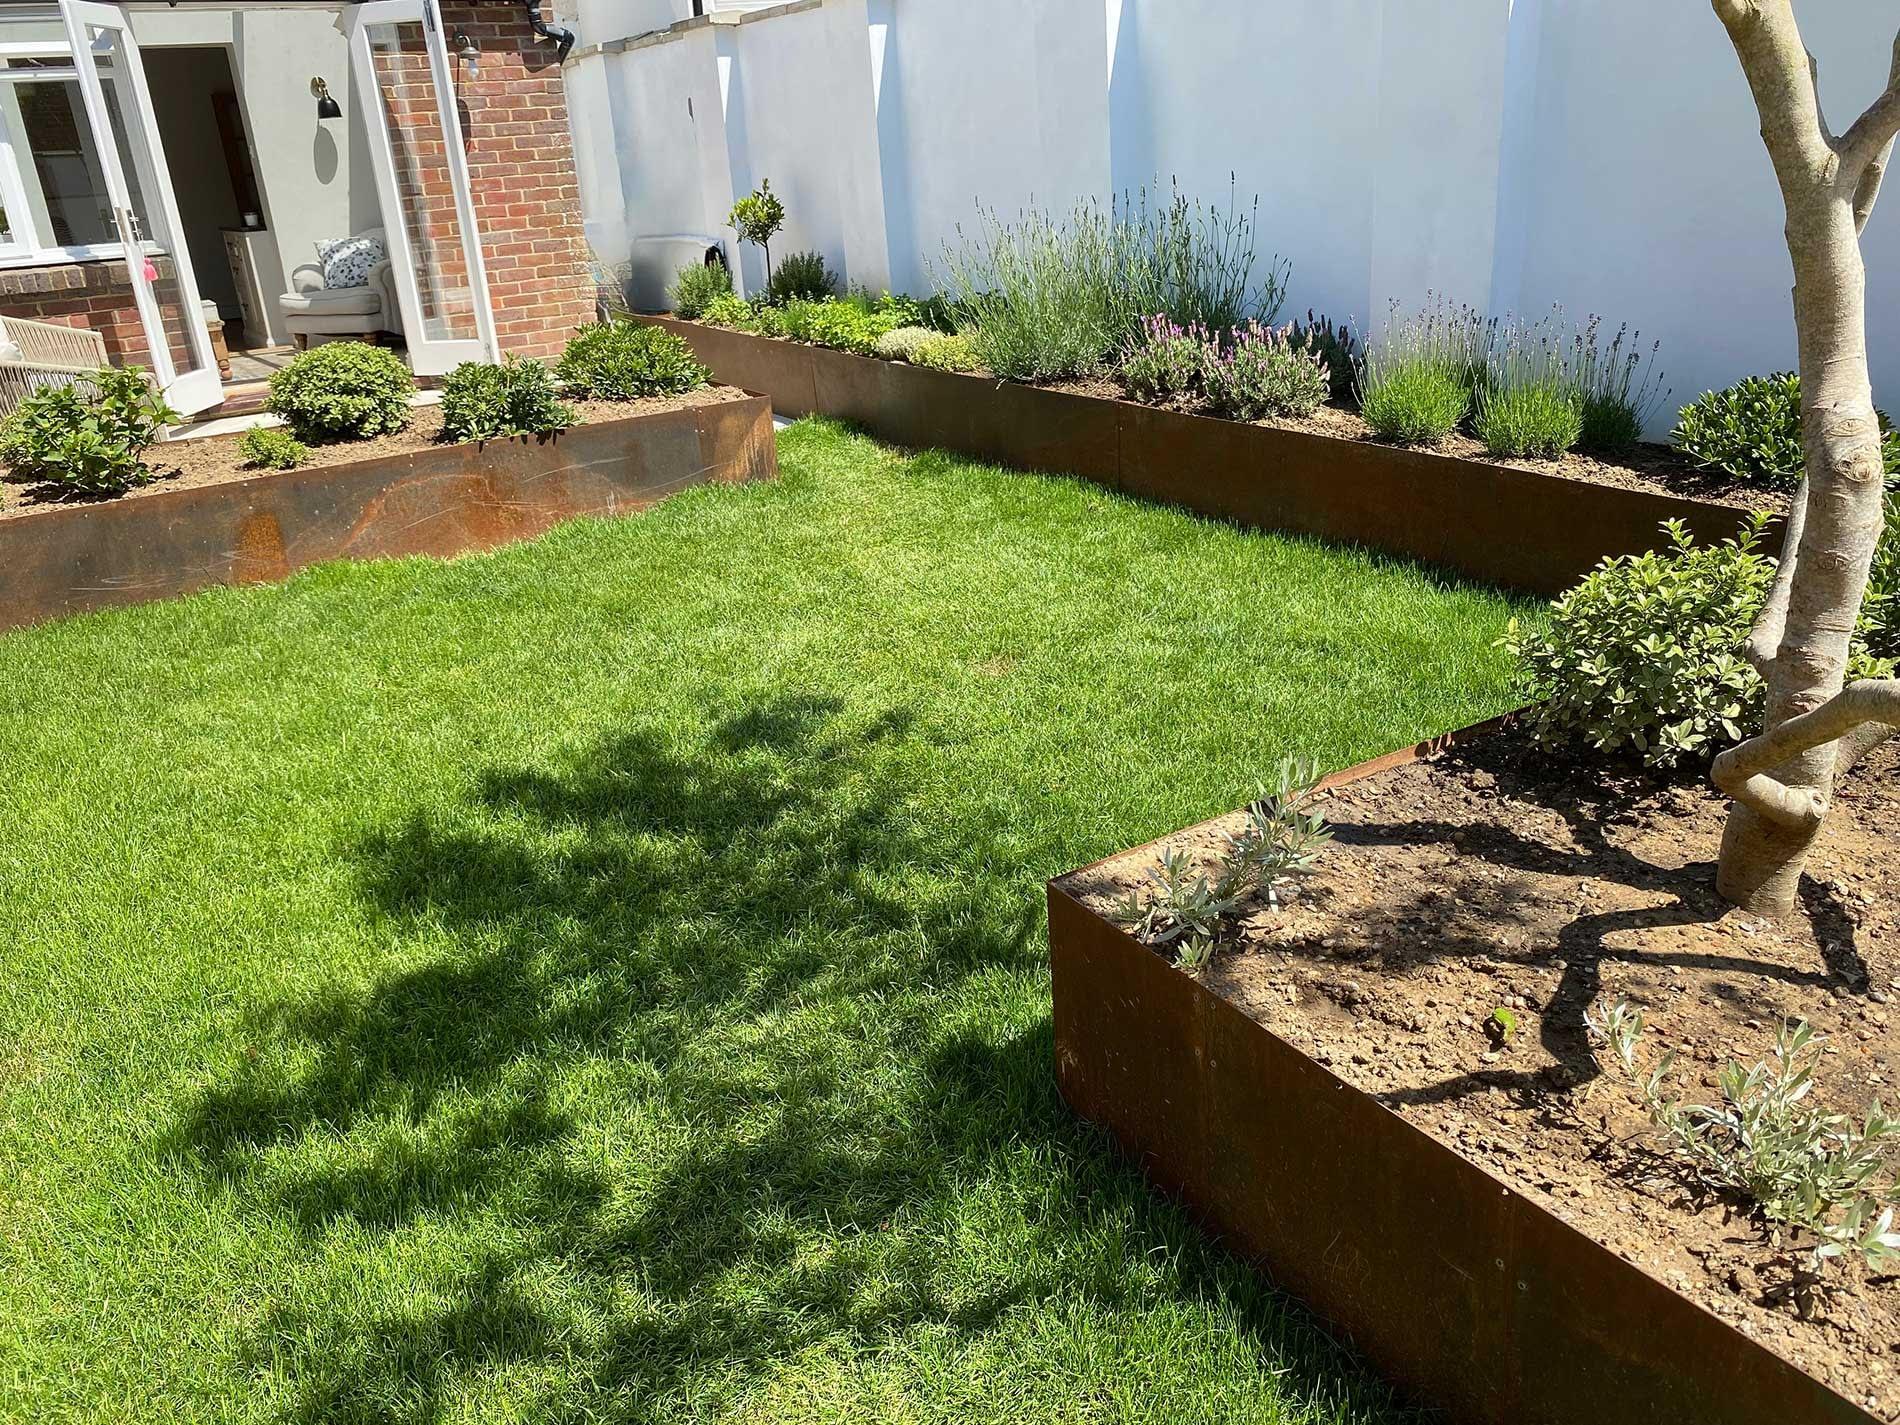 brighton garden Raised planter